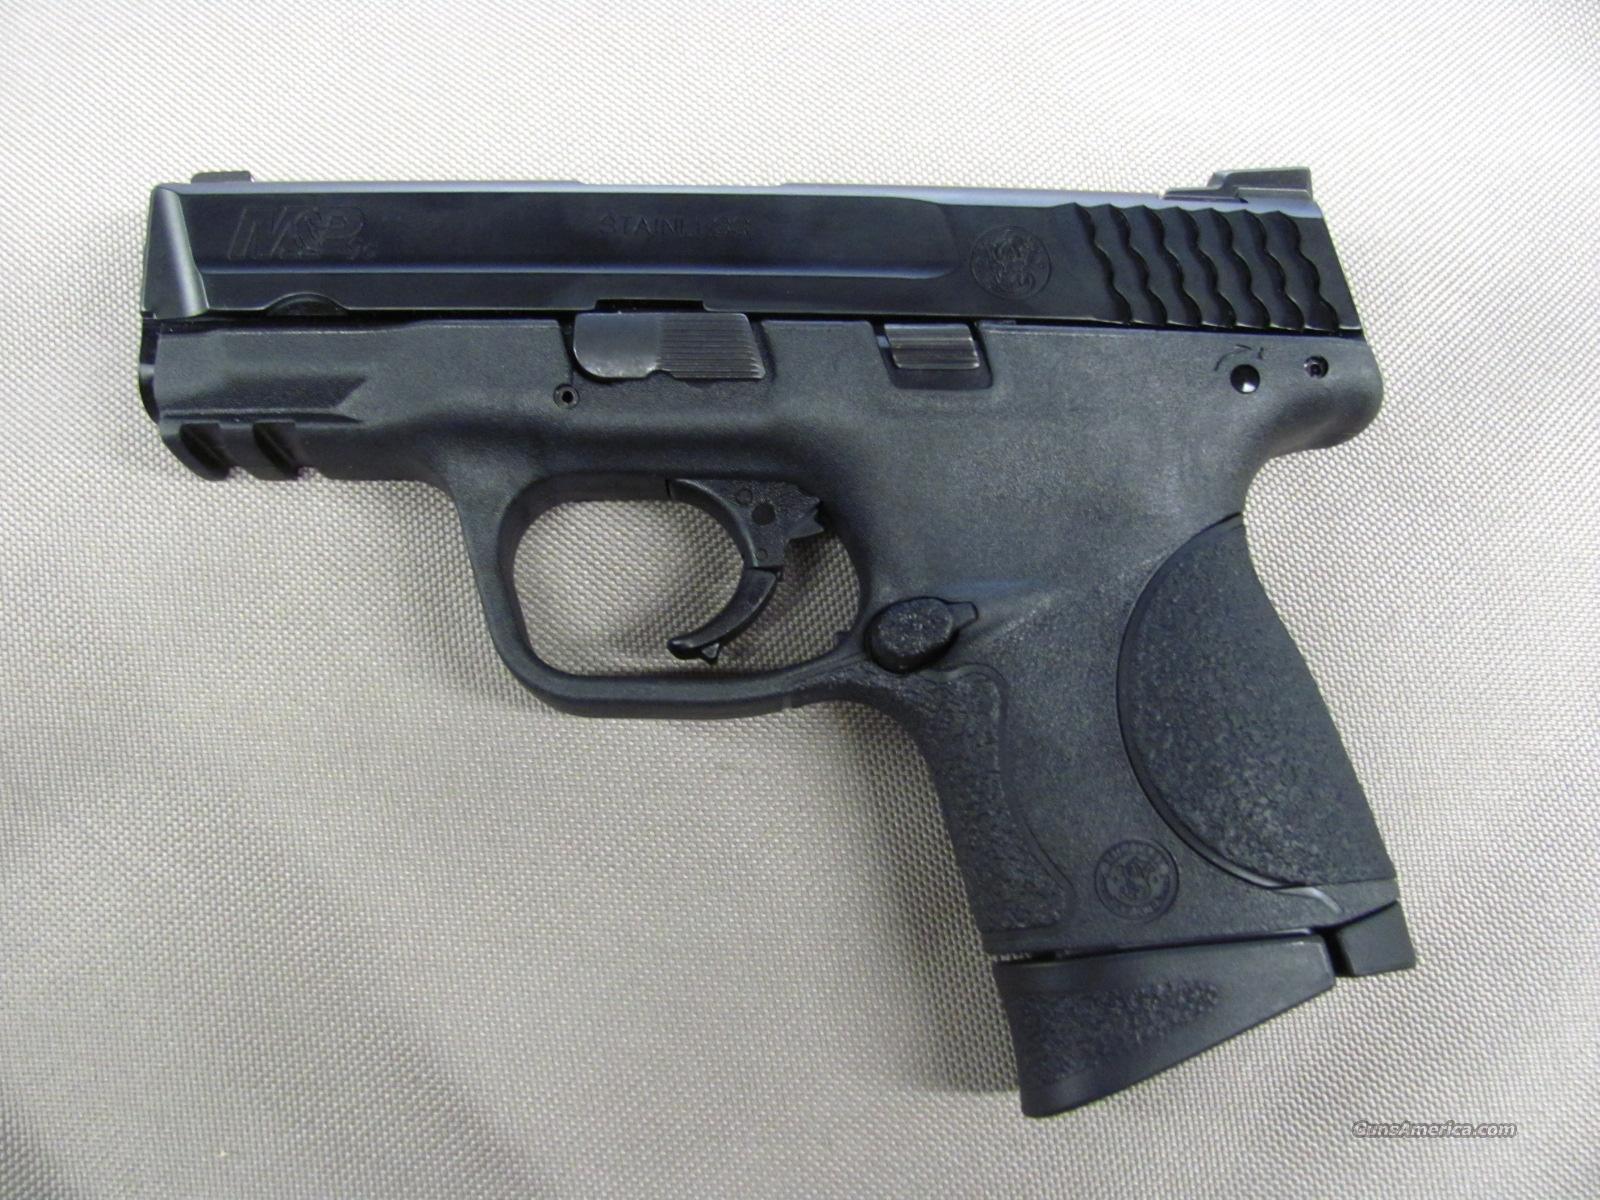 Smith & Wesson M&P 9c Talo 9 mm With XGRIP  **NEW**  Guns > Pistols > Smith & Wesson Pistols - Autos > Polymer Frame